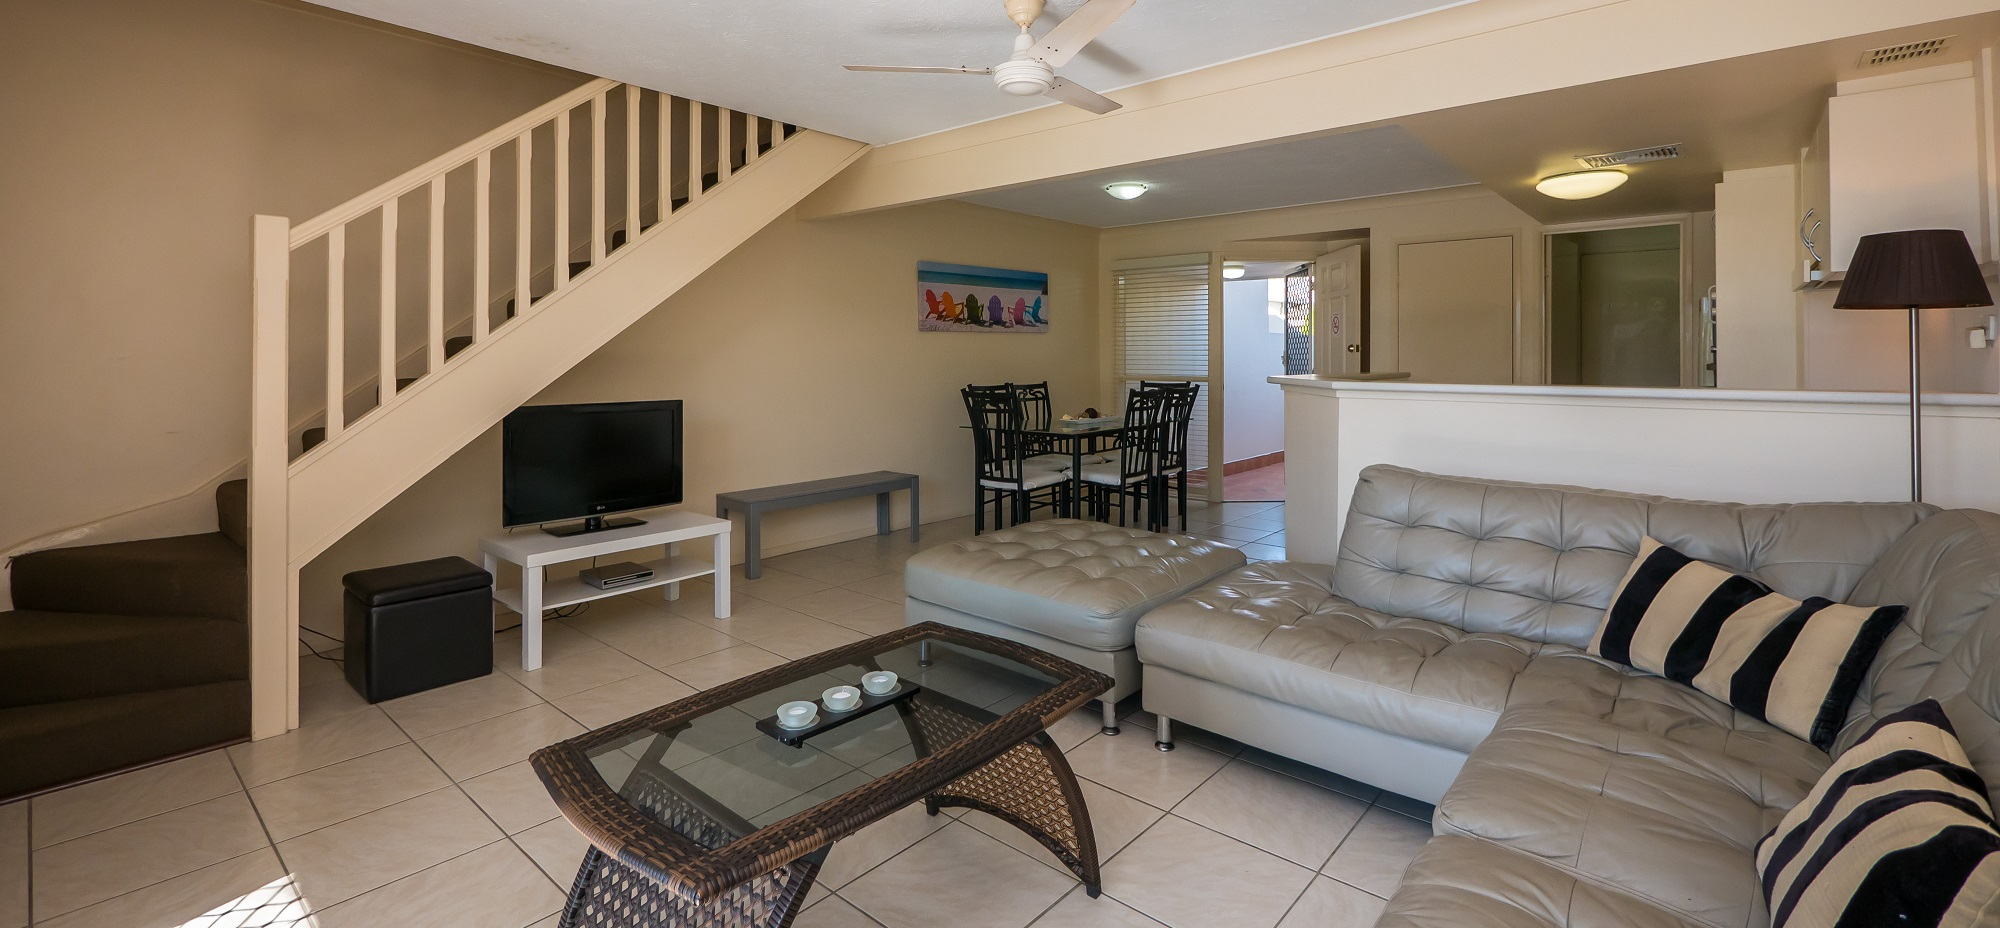 Isle of Palms Resort Accommodation - Lounge Room